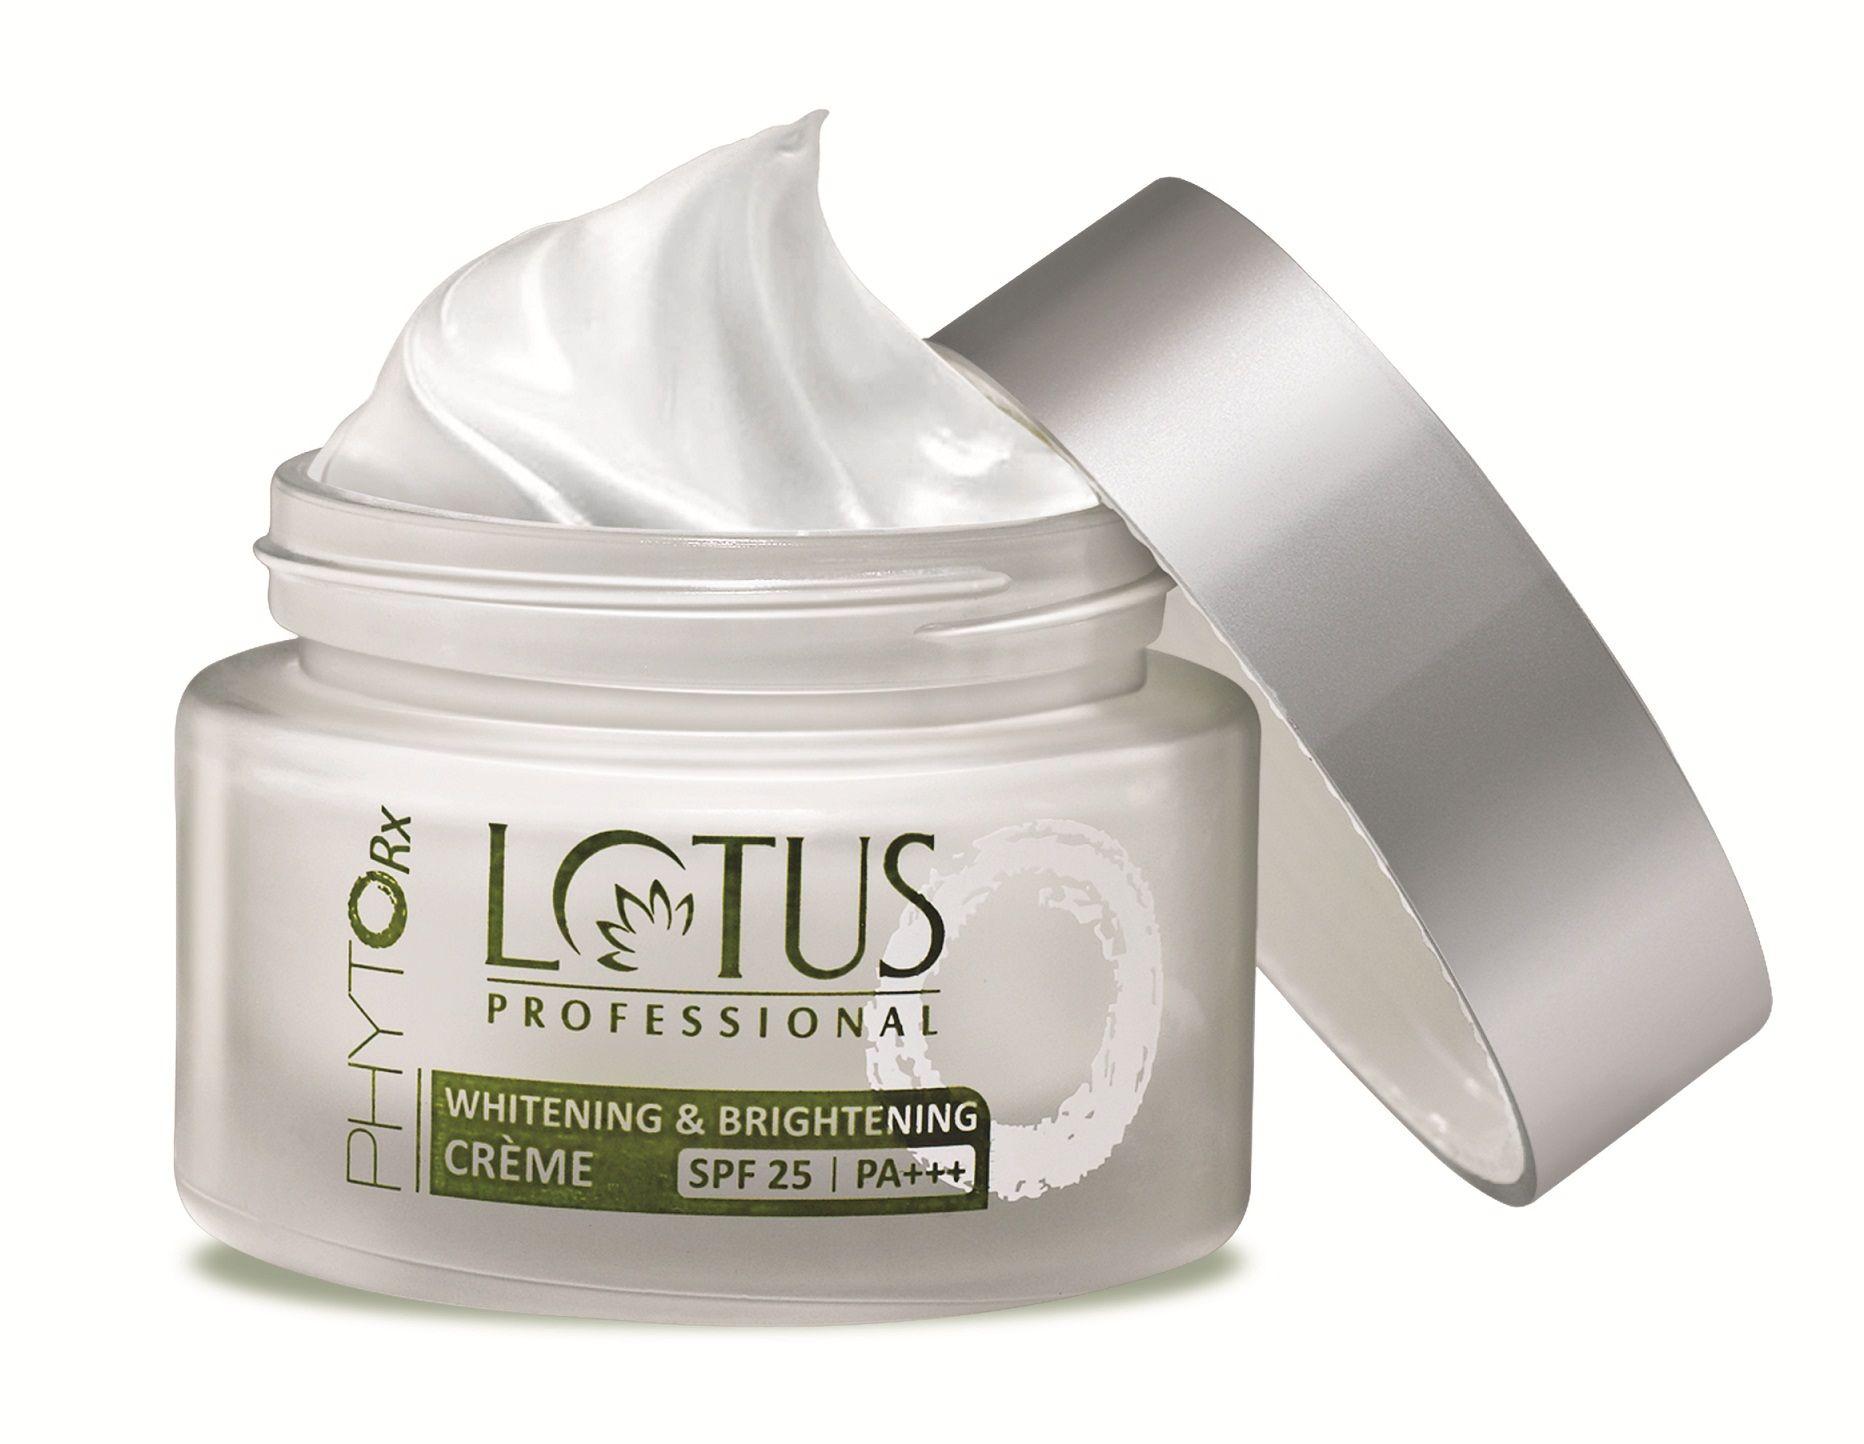 Lotus Professional Phyto-Rx Whitening & Brightening Creme SPF 25 PA